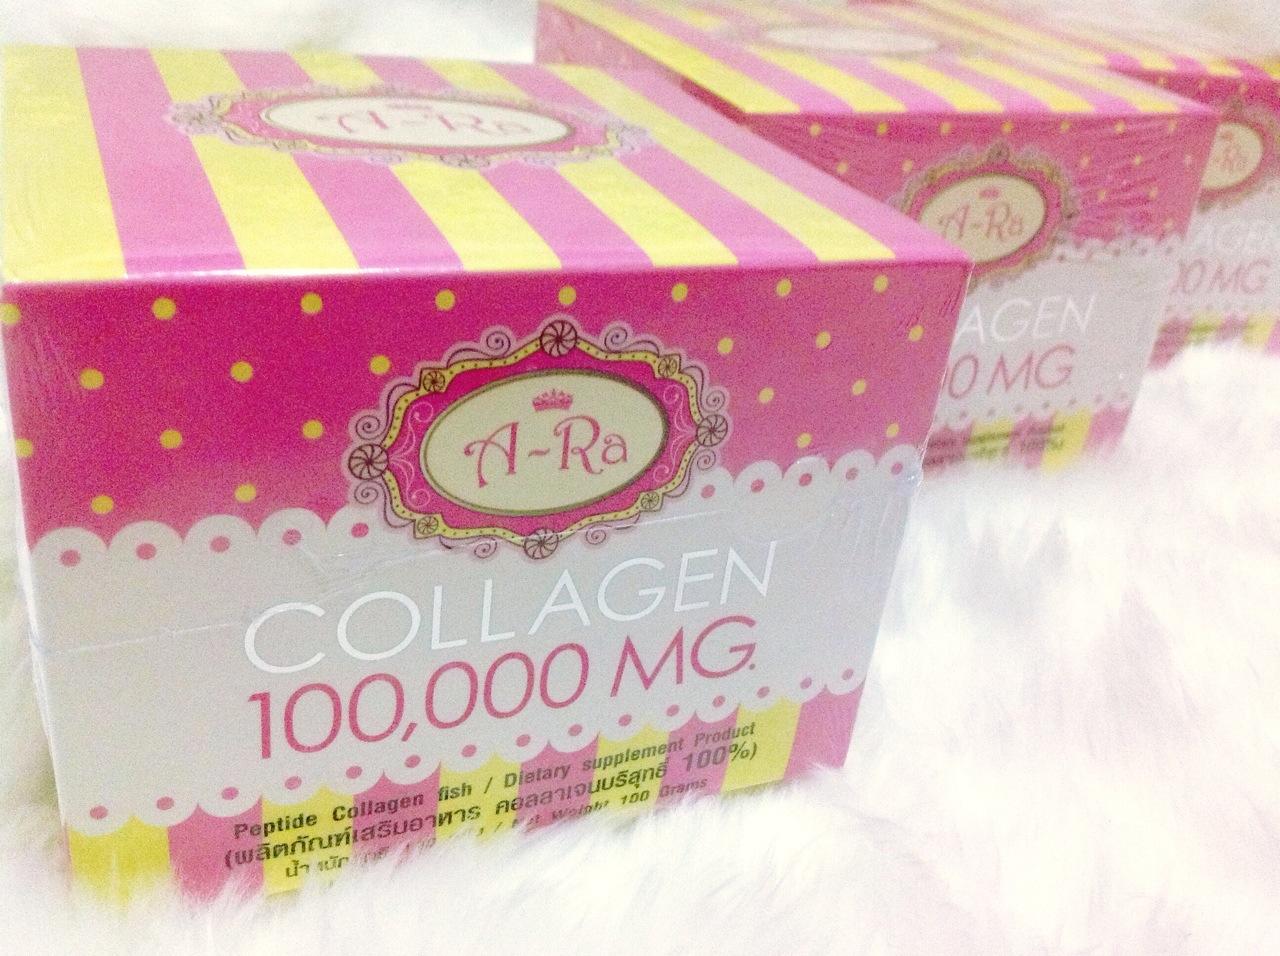 A-Ra Collagen 100,000mg. เอ ระ คอลลาเจน 100,000 สุดยอด แห่งความขาว